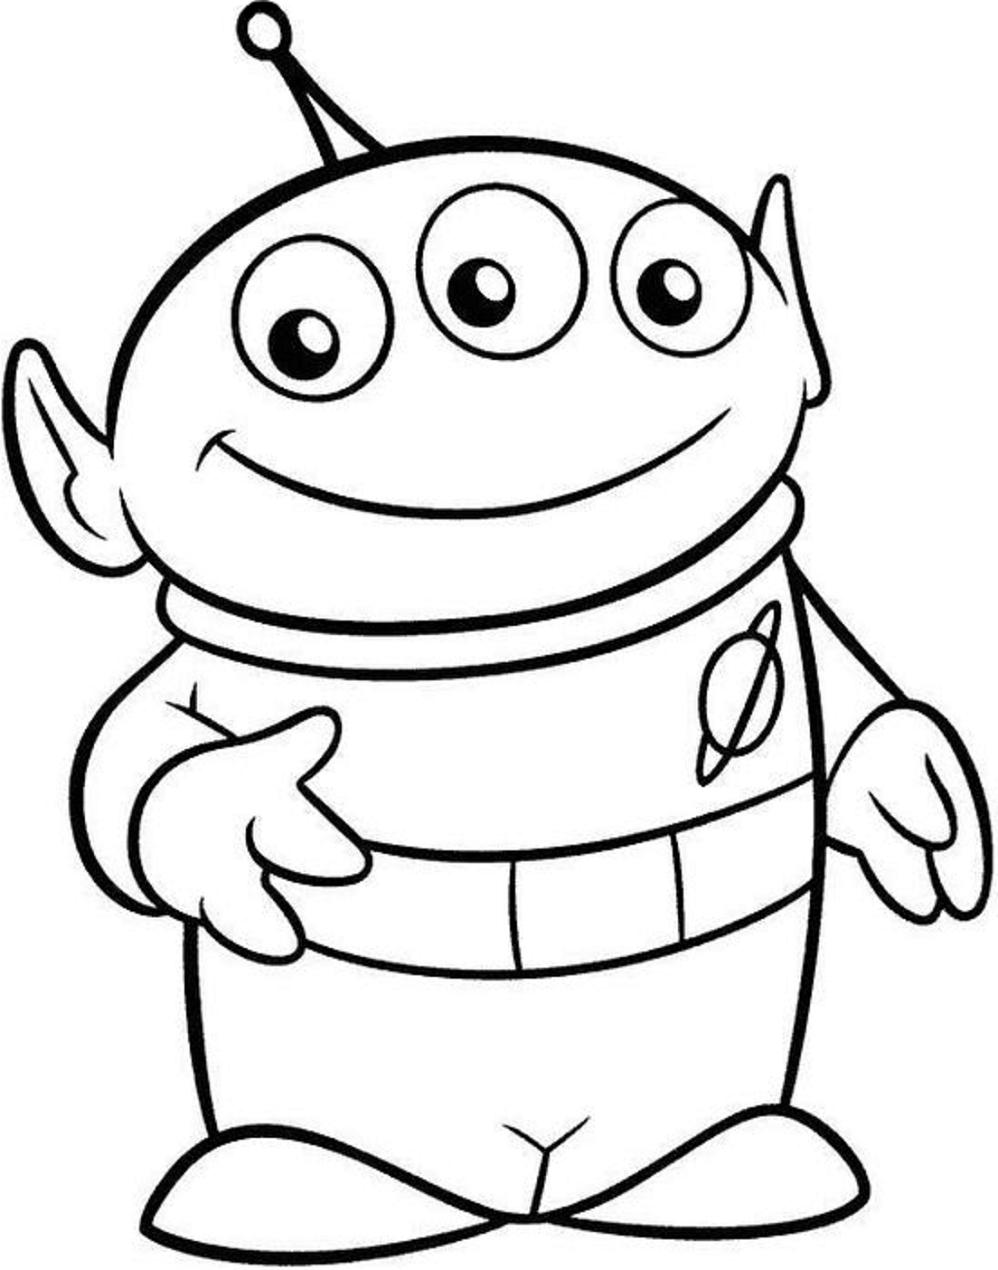 Dibujos De Marciano De Toy Story 4 Para Colorear Pintar E